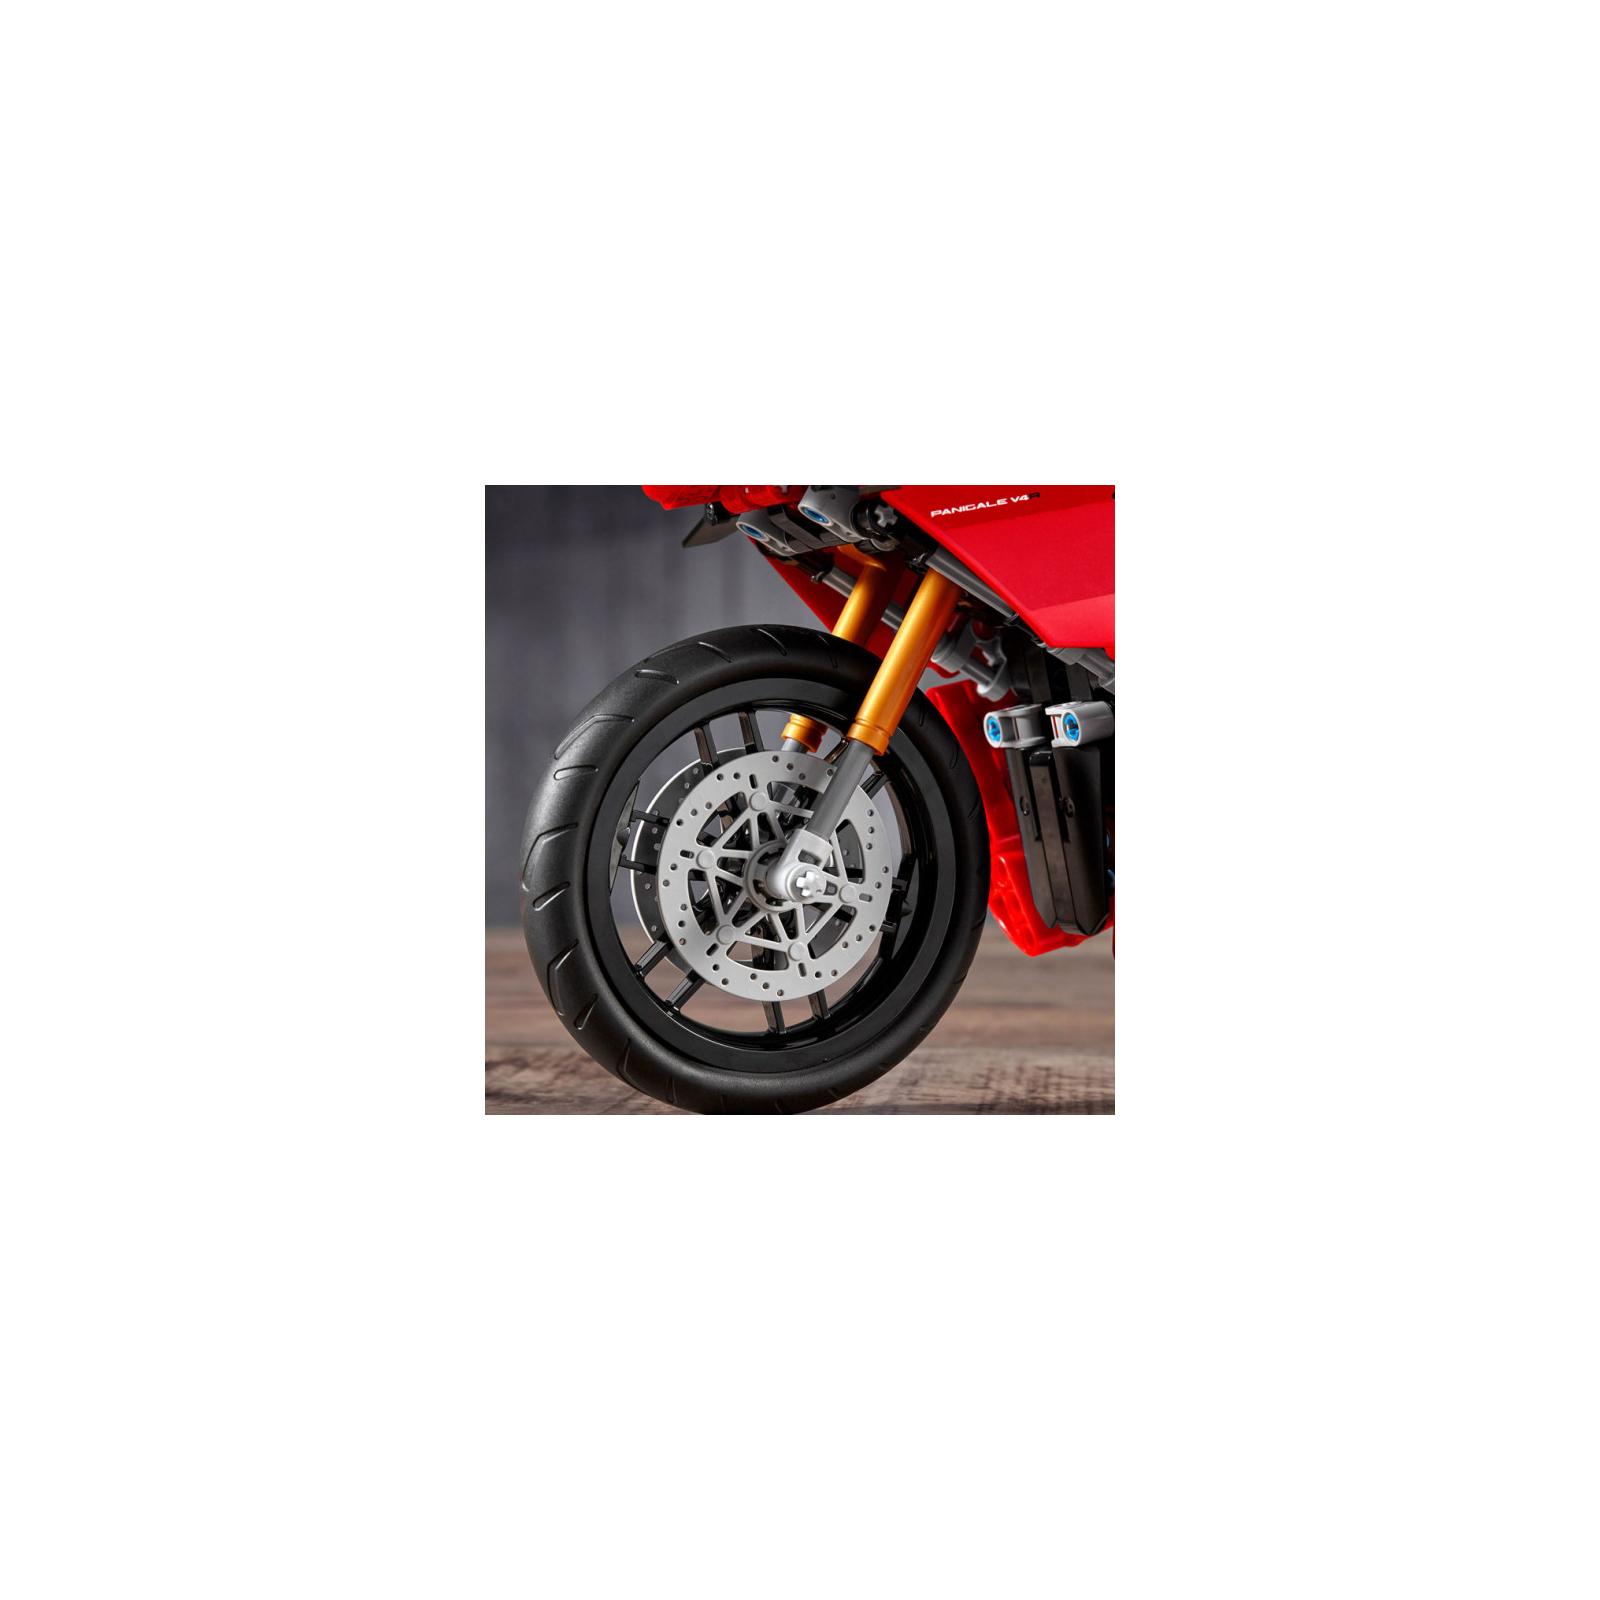 Конструктор LEGO Technic Ducati Panigale V4 R 0 646 детали (42107) изображение 8